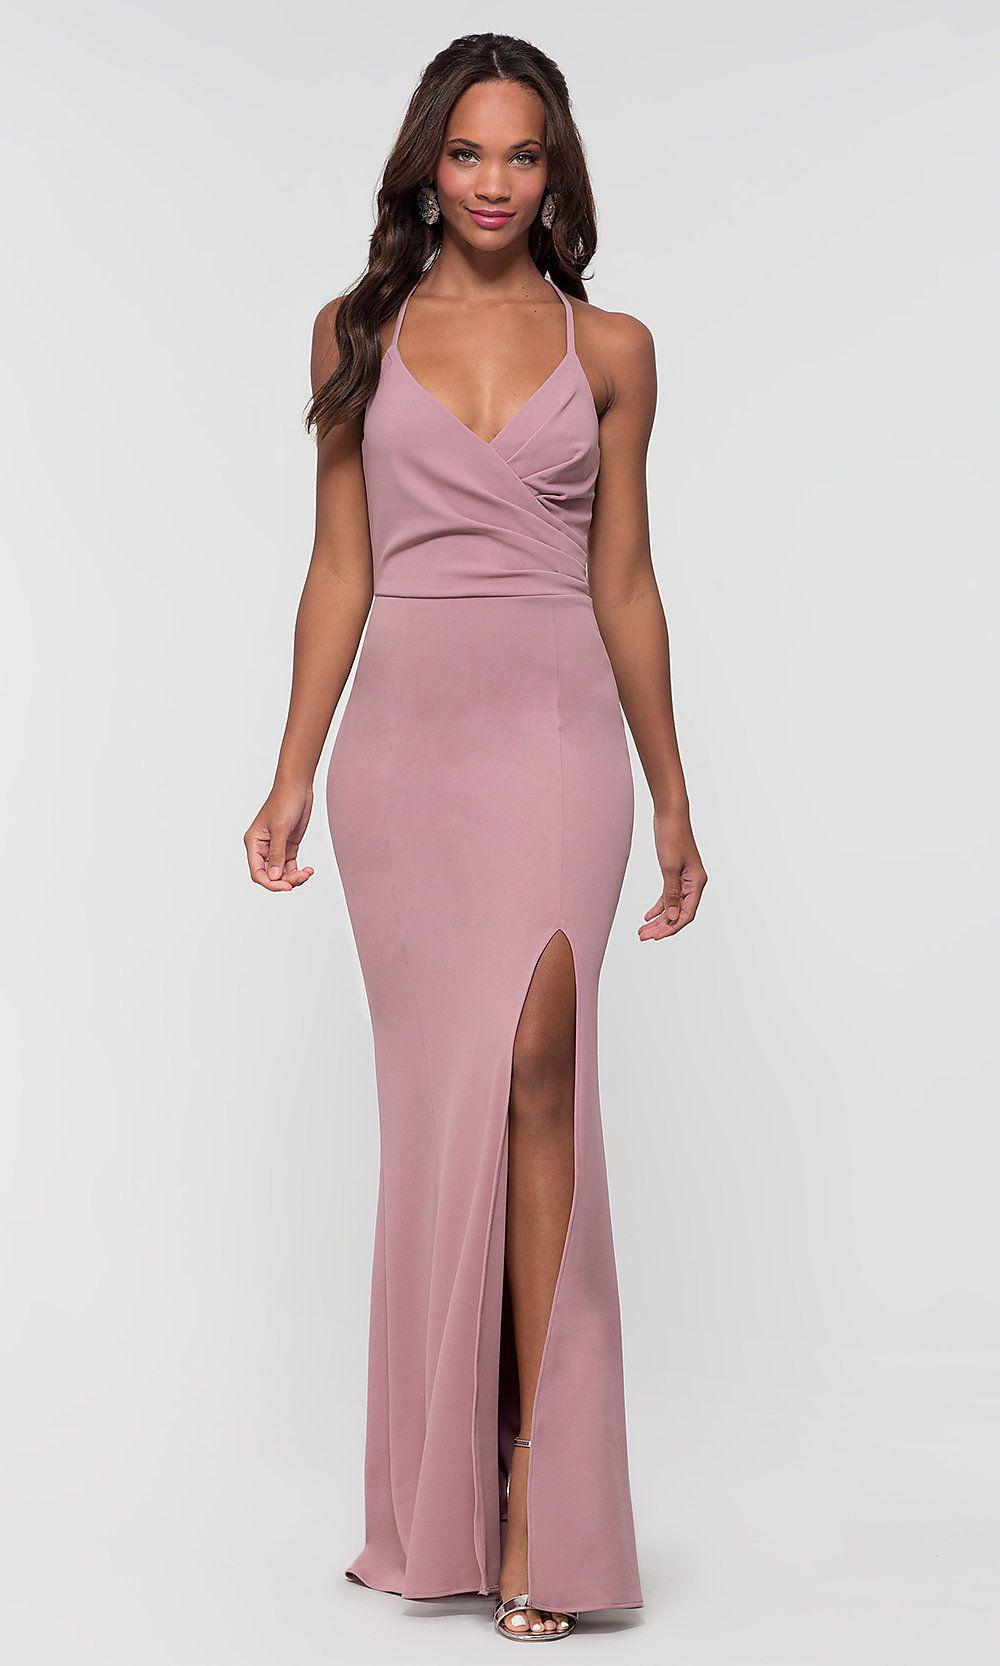 Open Back Long Wedding Guest Dress In Mauve Pink [ 1666 x 1000 Pixel ]